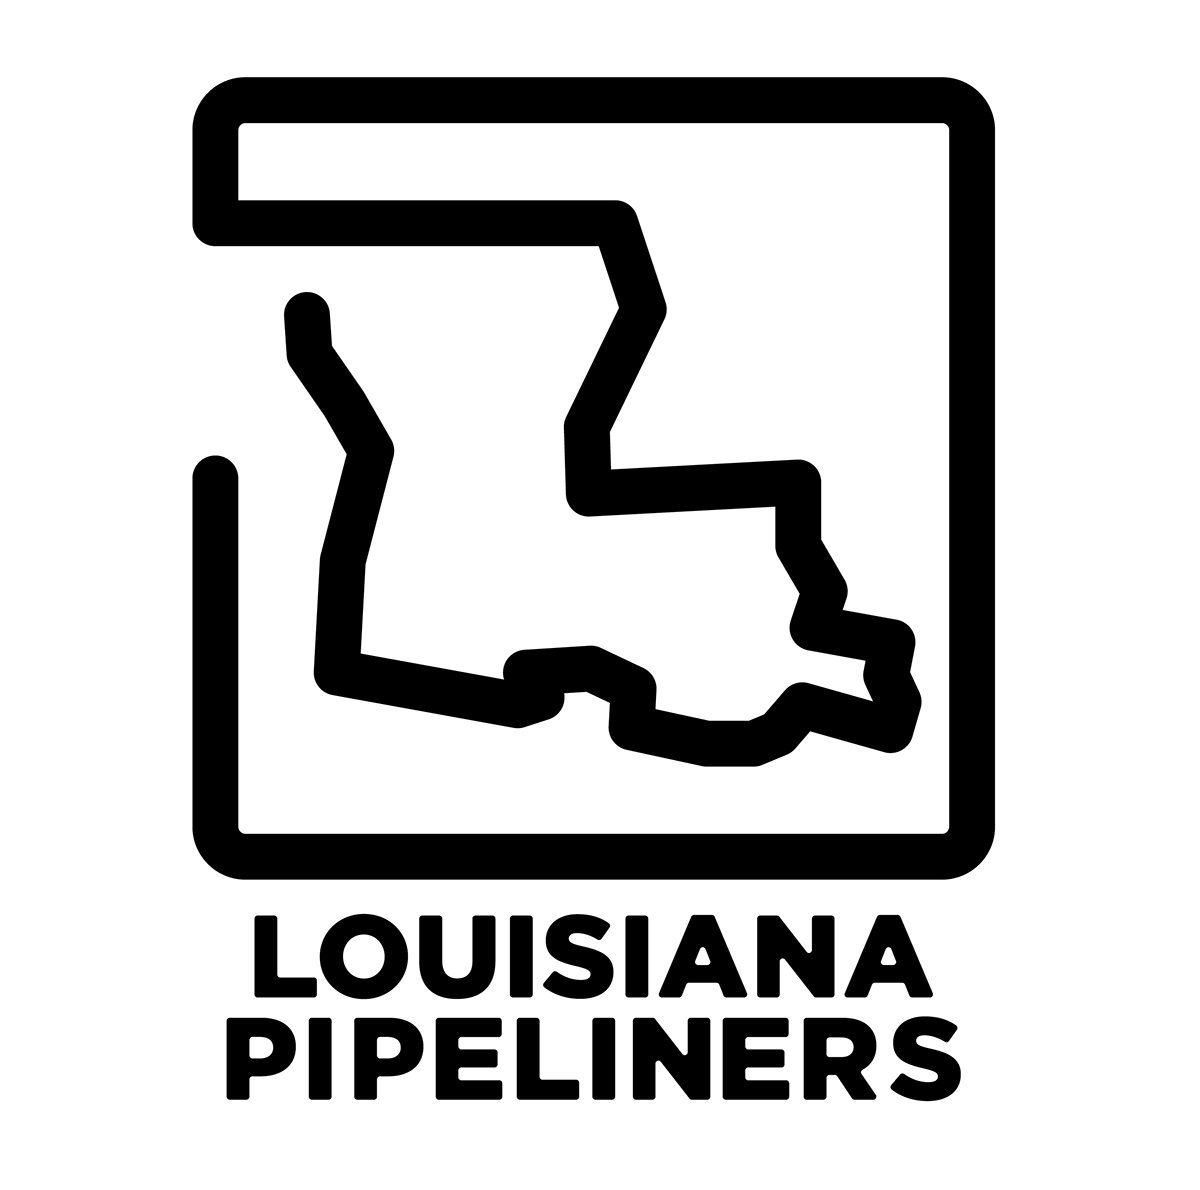 Crawfish clipart symbol louisiana. Pipeliners on behance logo